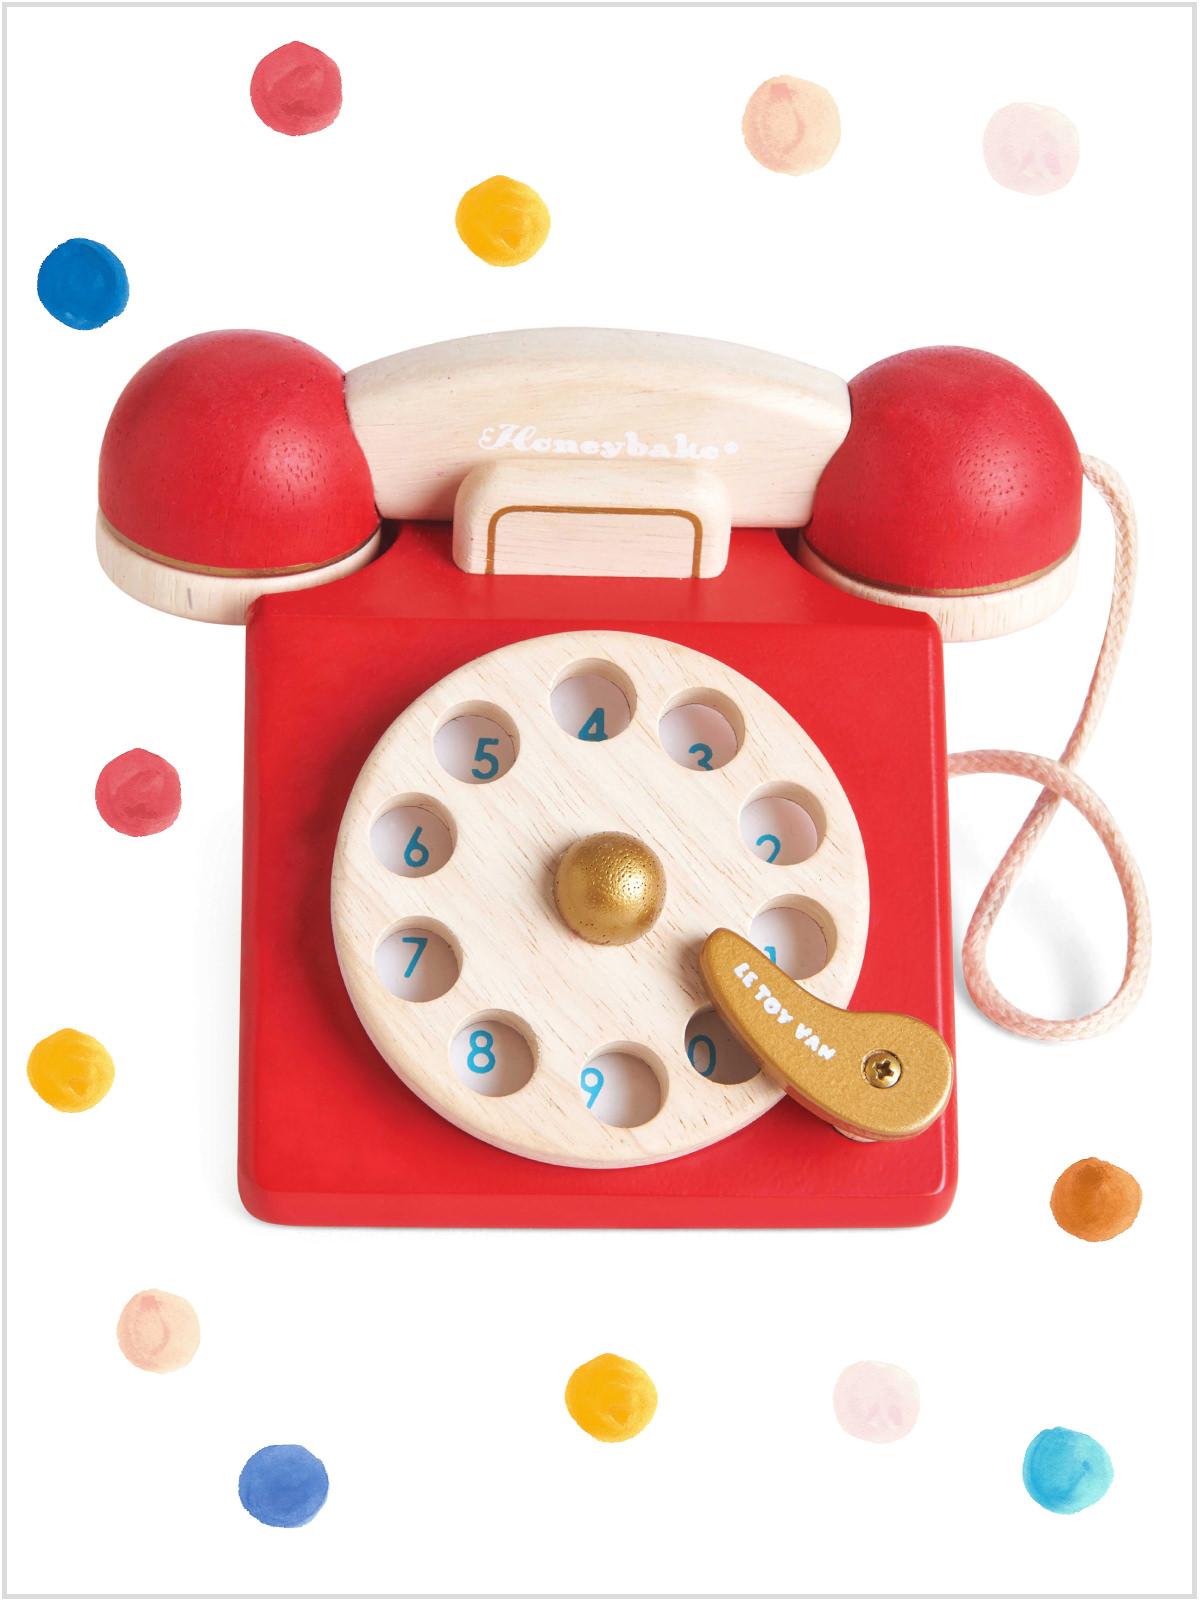 frederickandsophie-toys-letoyvan-honeybake-play-wooden-vintage-phone